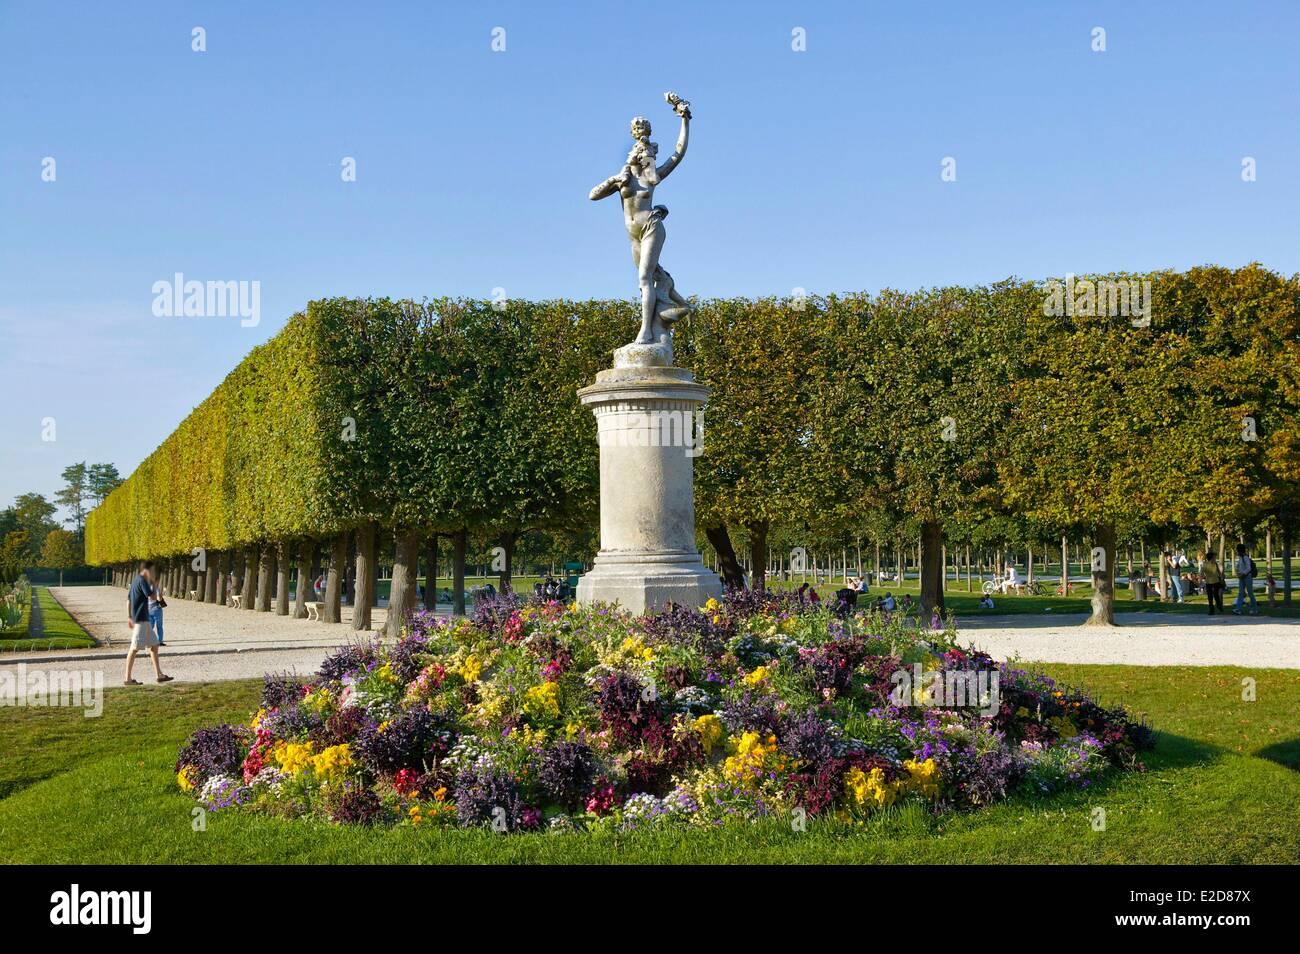 france yvelines saint germain en laye castle park gardens designed by stock photo royalty free. Black Bedroom Furniture Sets. Home Design Ideas